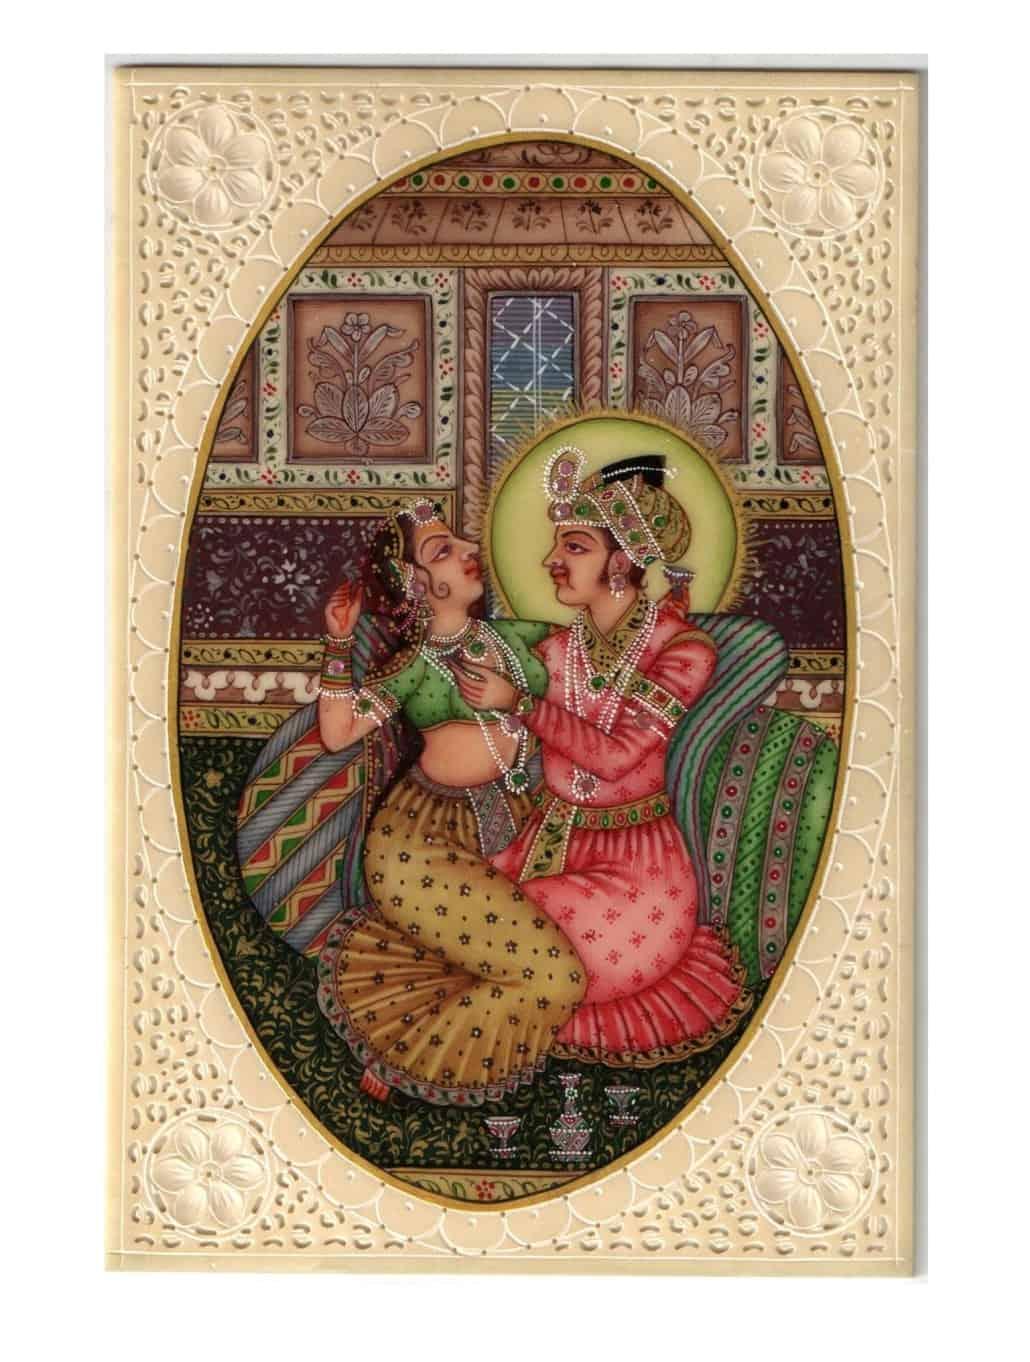 Indian Mughal Harem Erotic Miniature Painting Handicraft